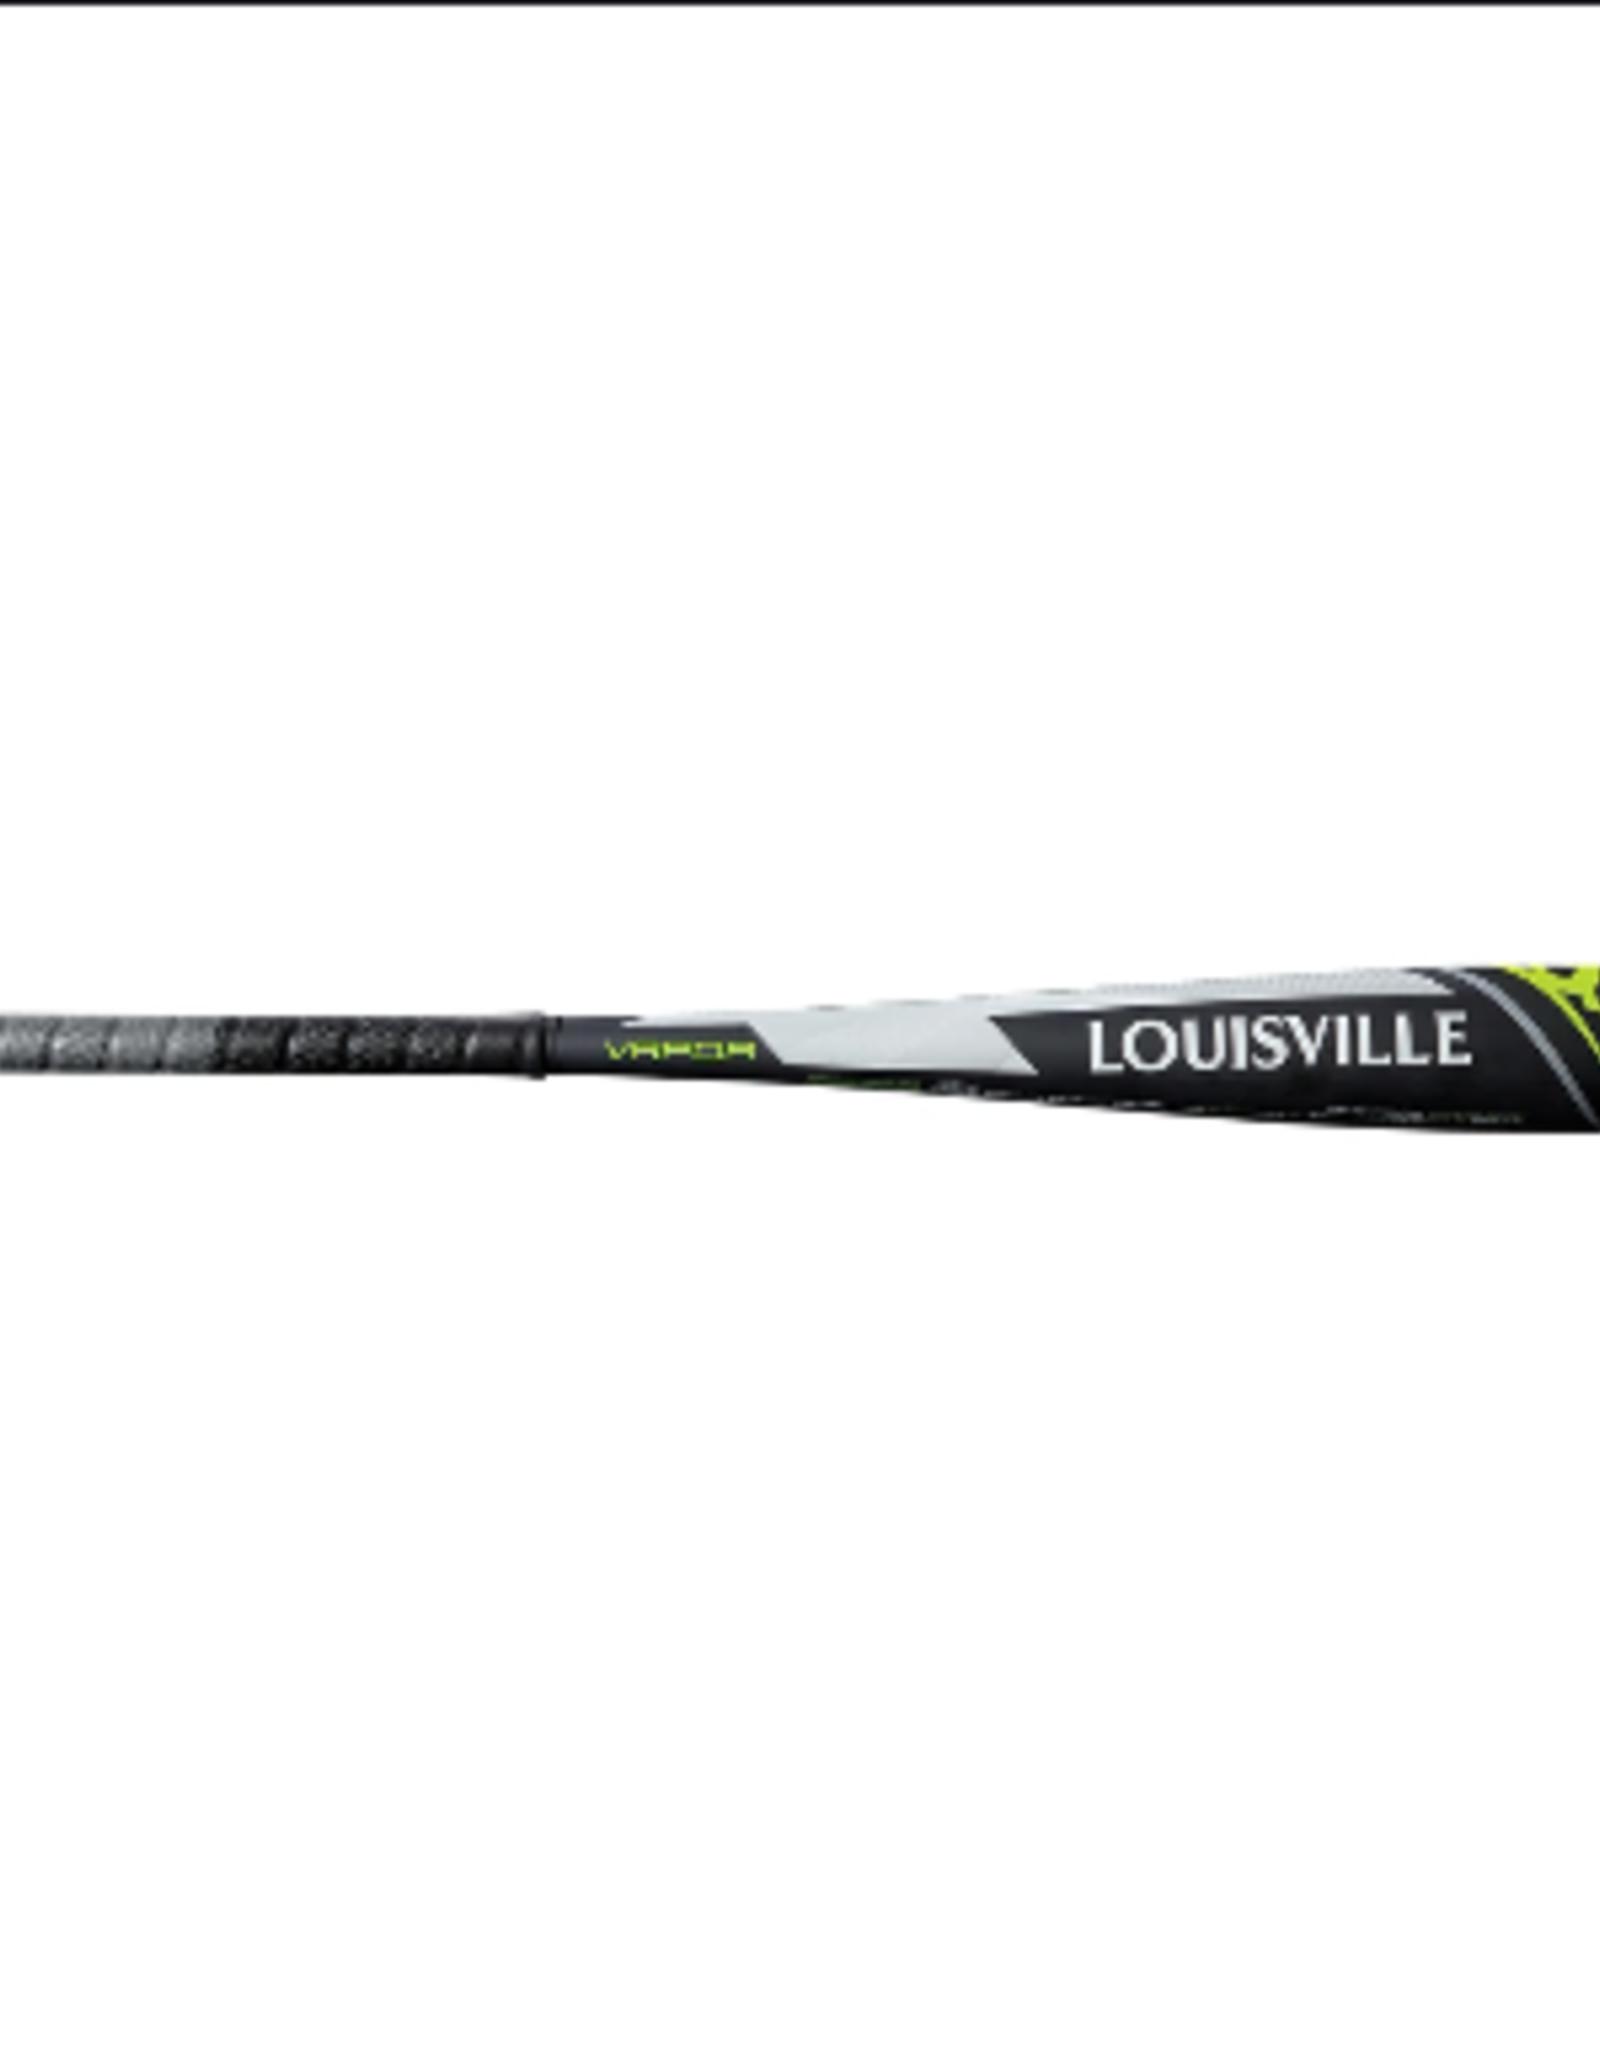 Louisville (Canada) LS LOUISVILLE SLUGGER NON WOOD BAT  USA BASEBALL VAPOR  9 2 5/8 USA BASEBALL 32 BLK-WHITE-GREEN